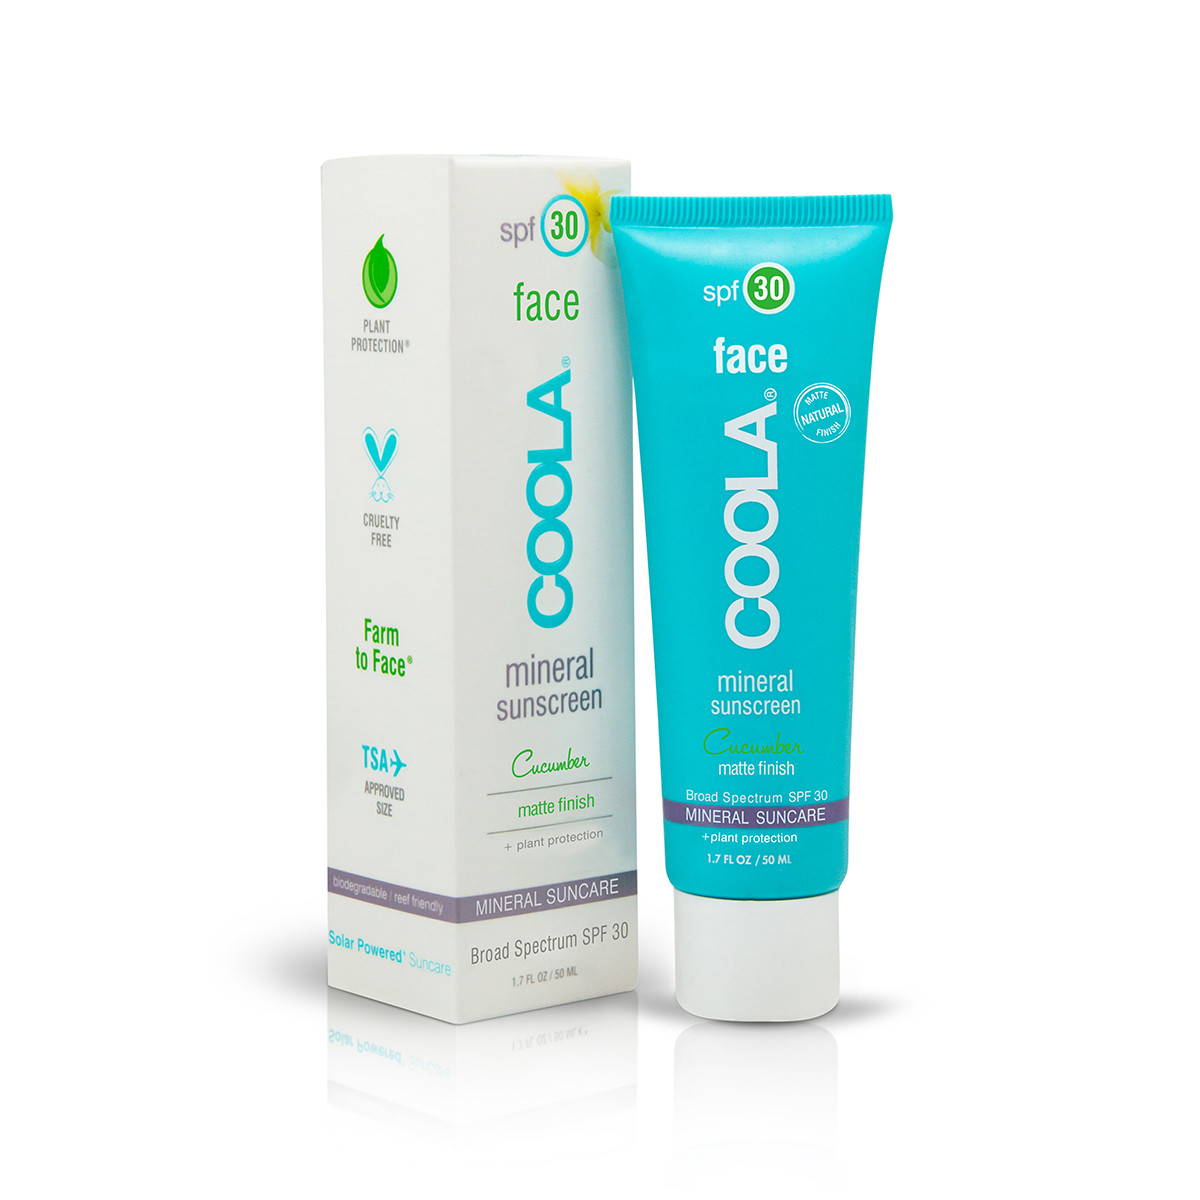 COOLA 超裸奇肌礦物防曬霜SPF30(50ml)➤結帳88折、2件85折